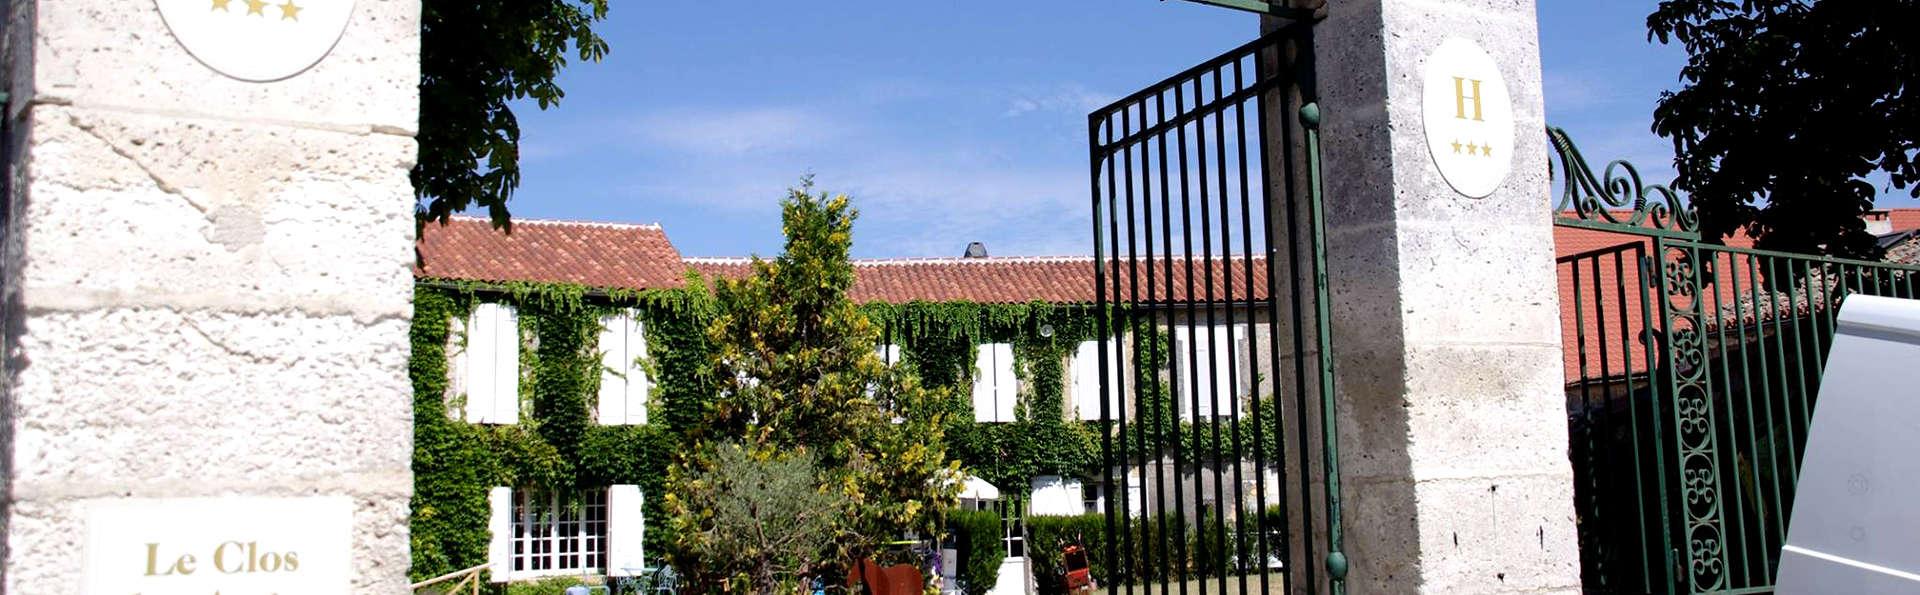 Domaine du Châtelard - Edit_Entrance.jpg